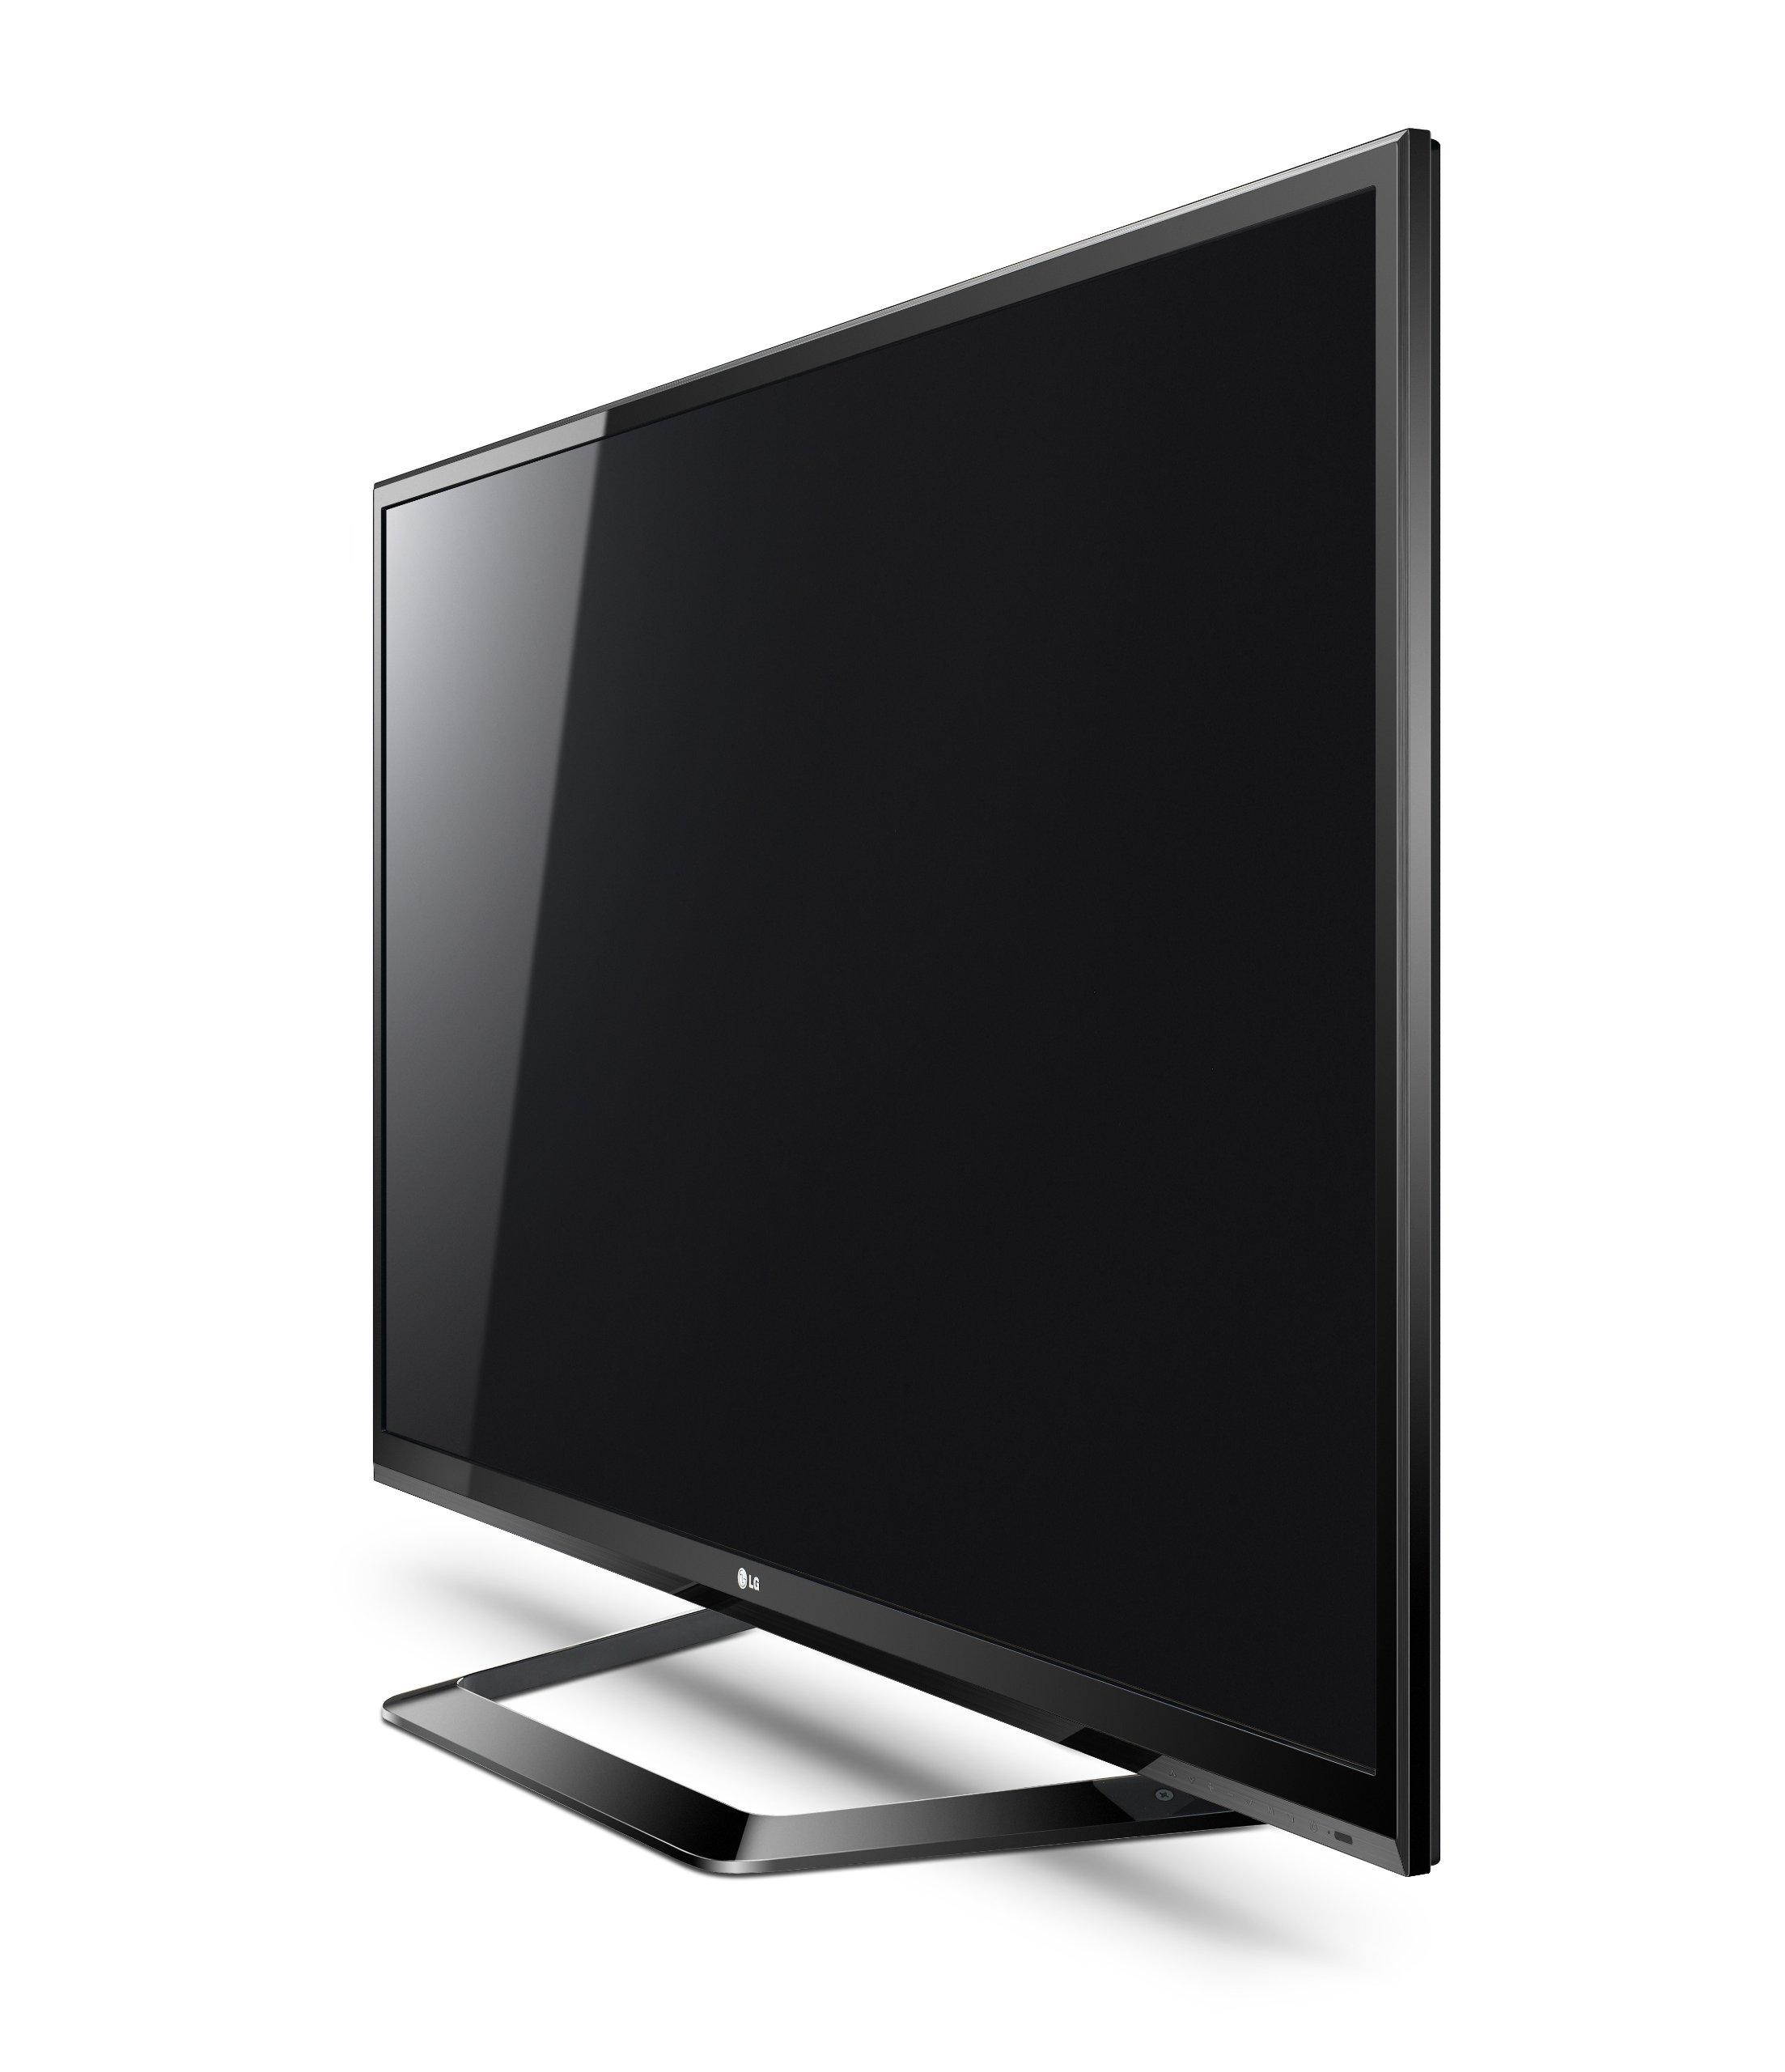 LG 42LM615s - Televisor LED, 42 pulgadas, HDMI 1.4, 1080p, DLNA ...